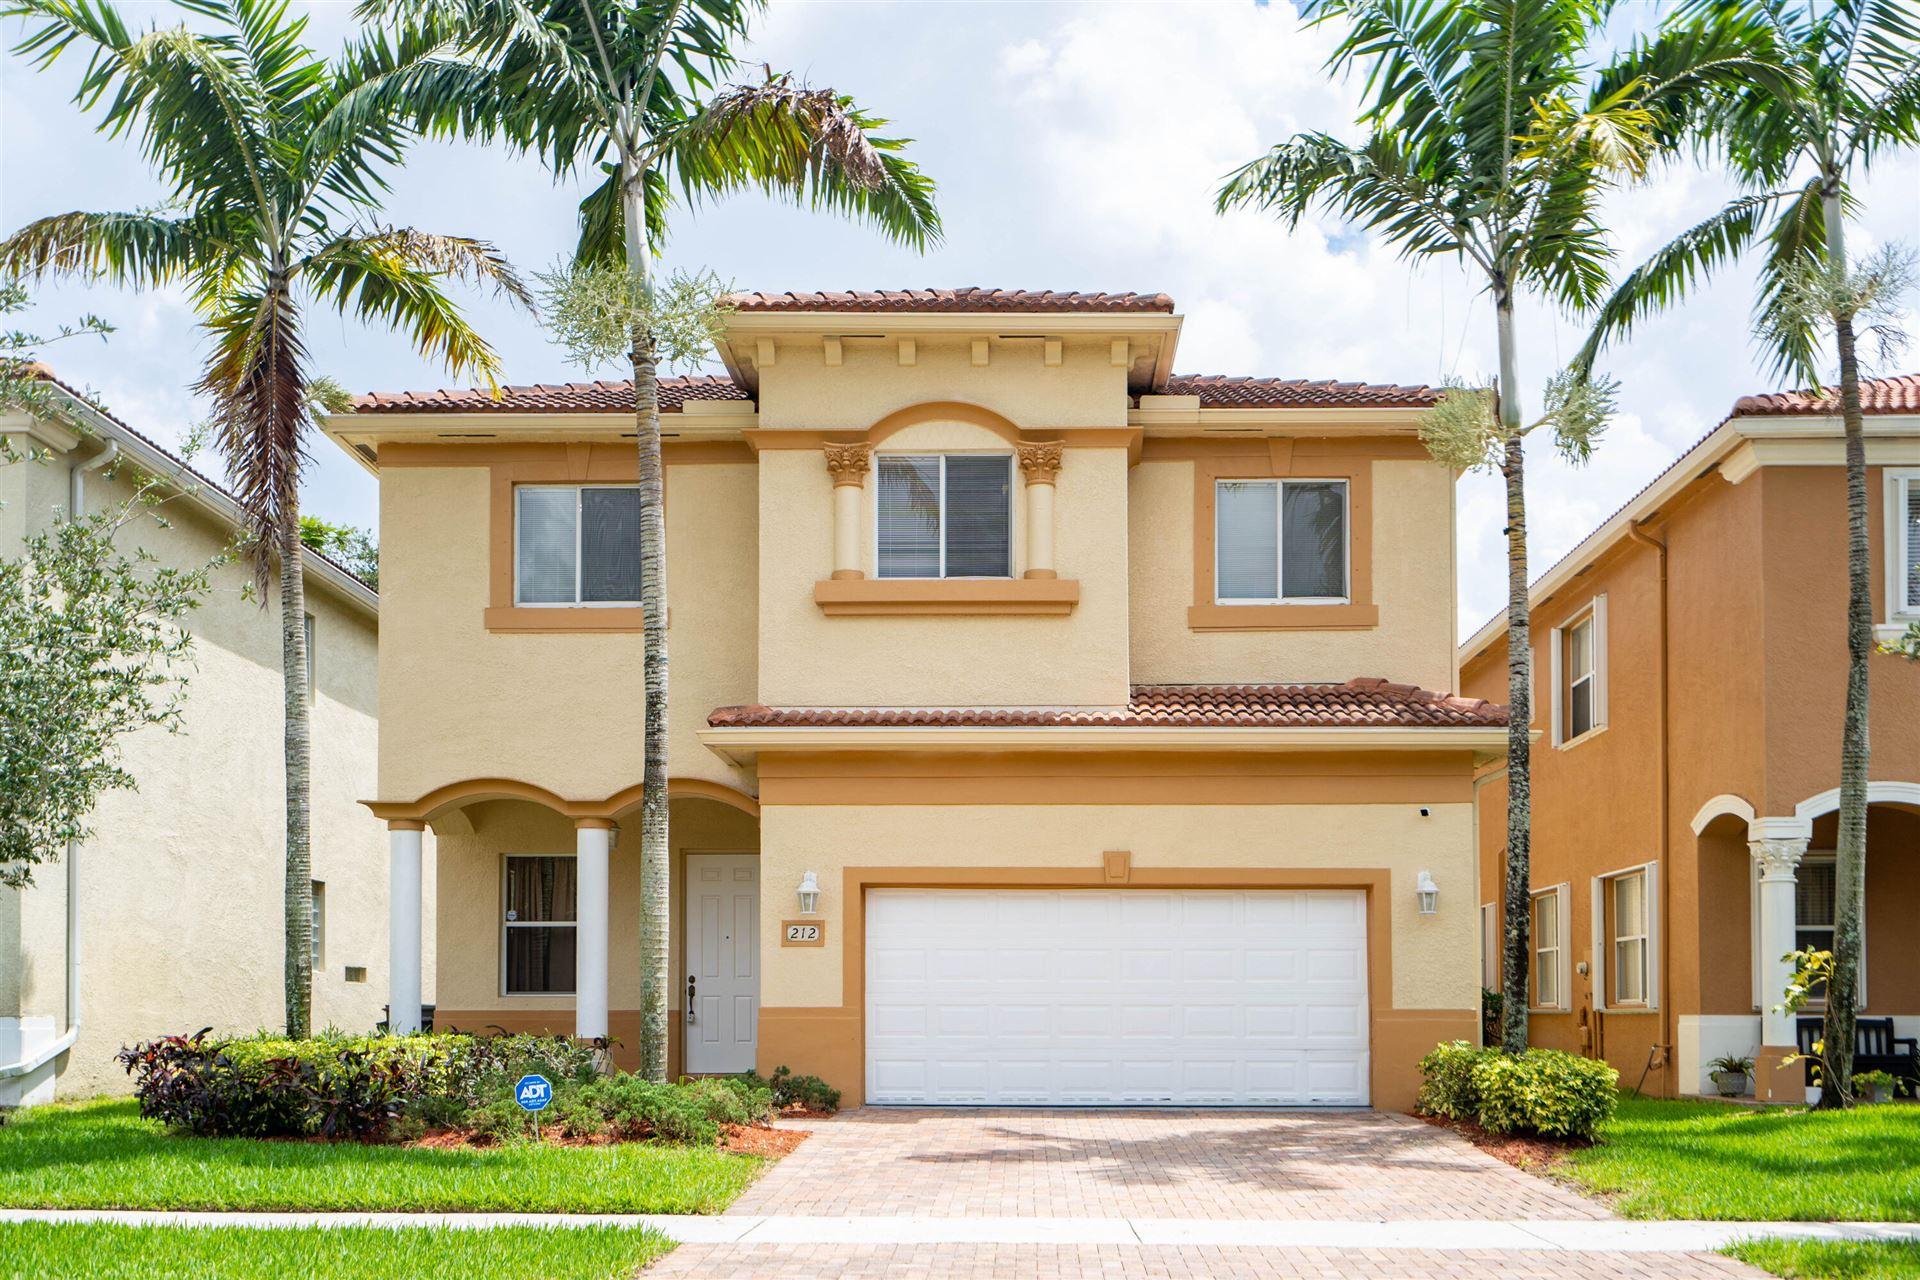 212 Gazetta Way, West Palm Beach, FL 33413 - MLS#: RX-10734115